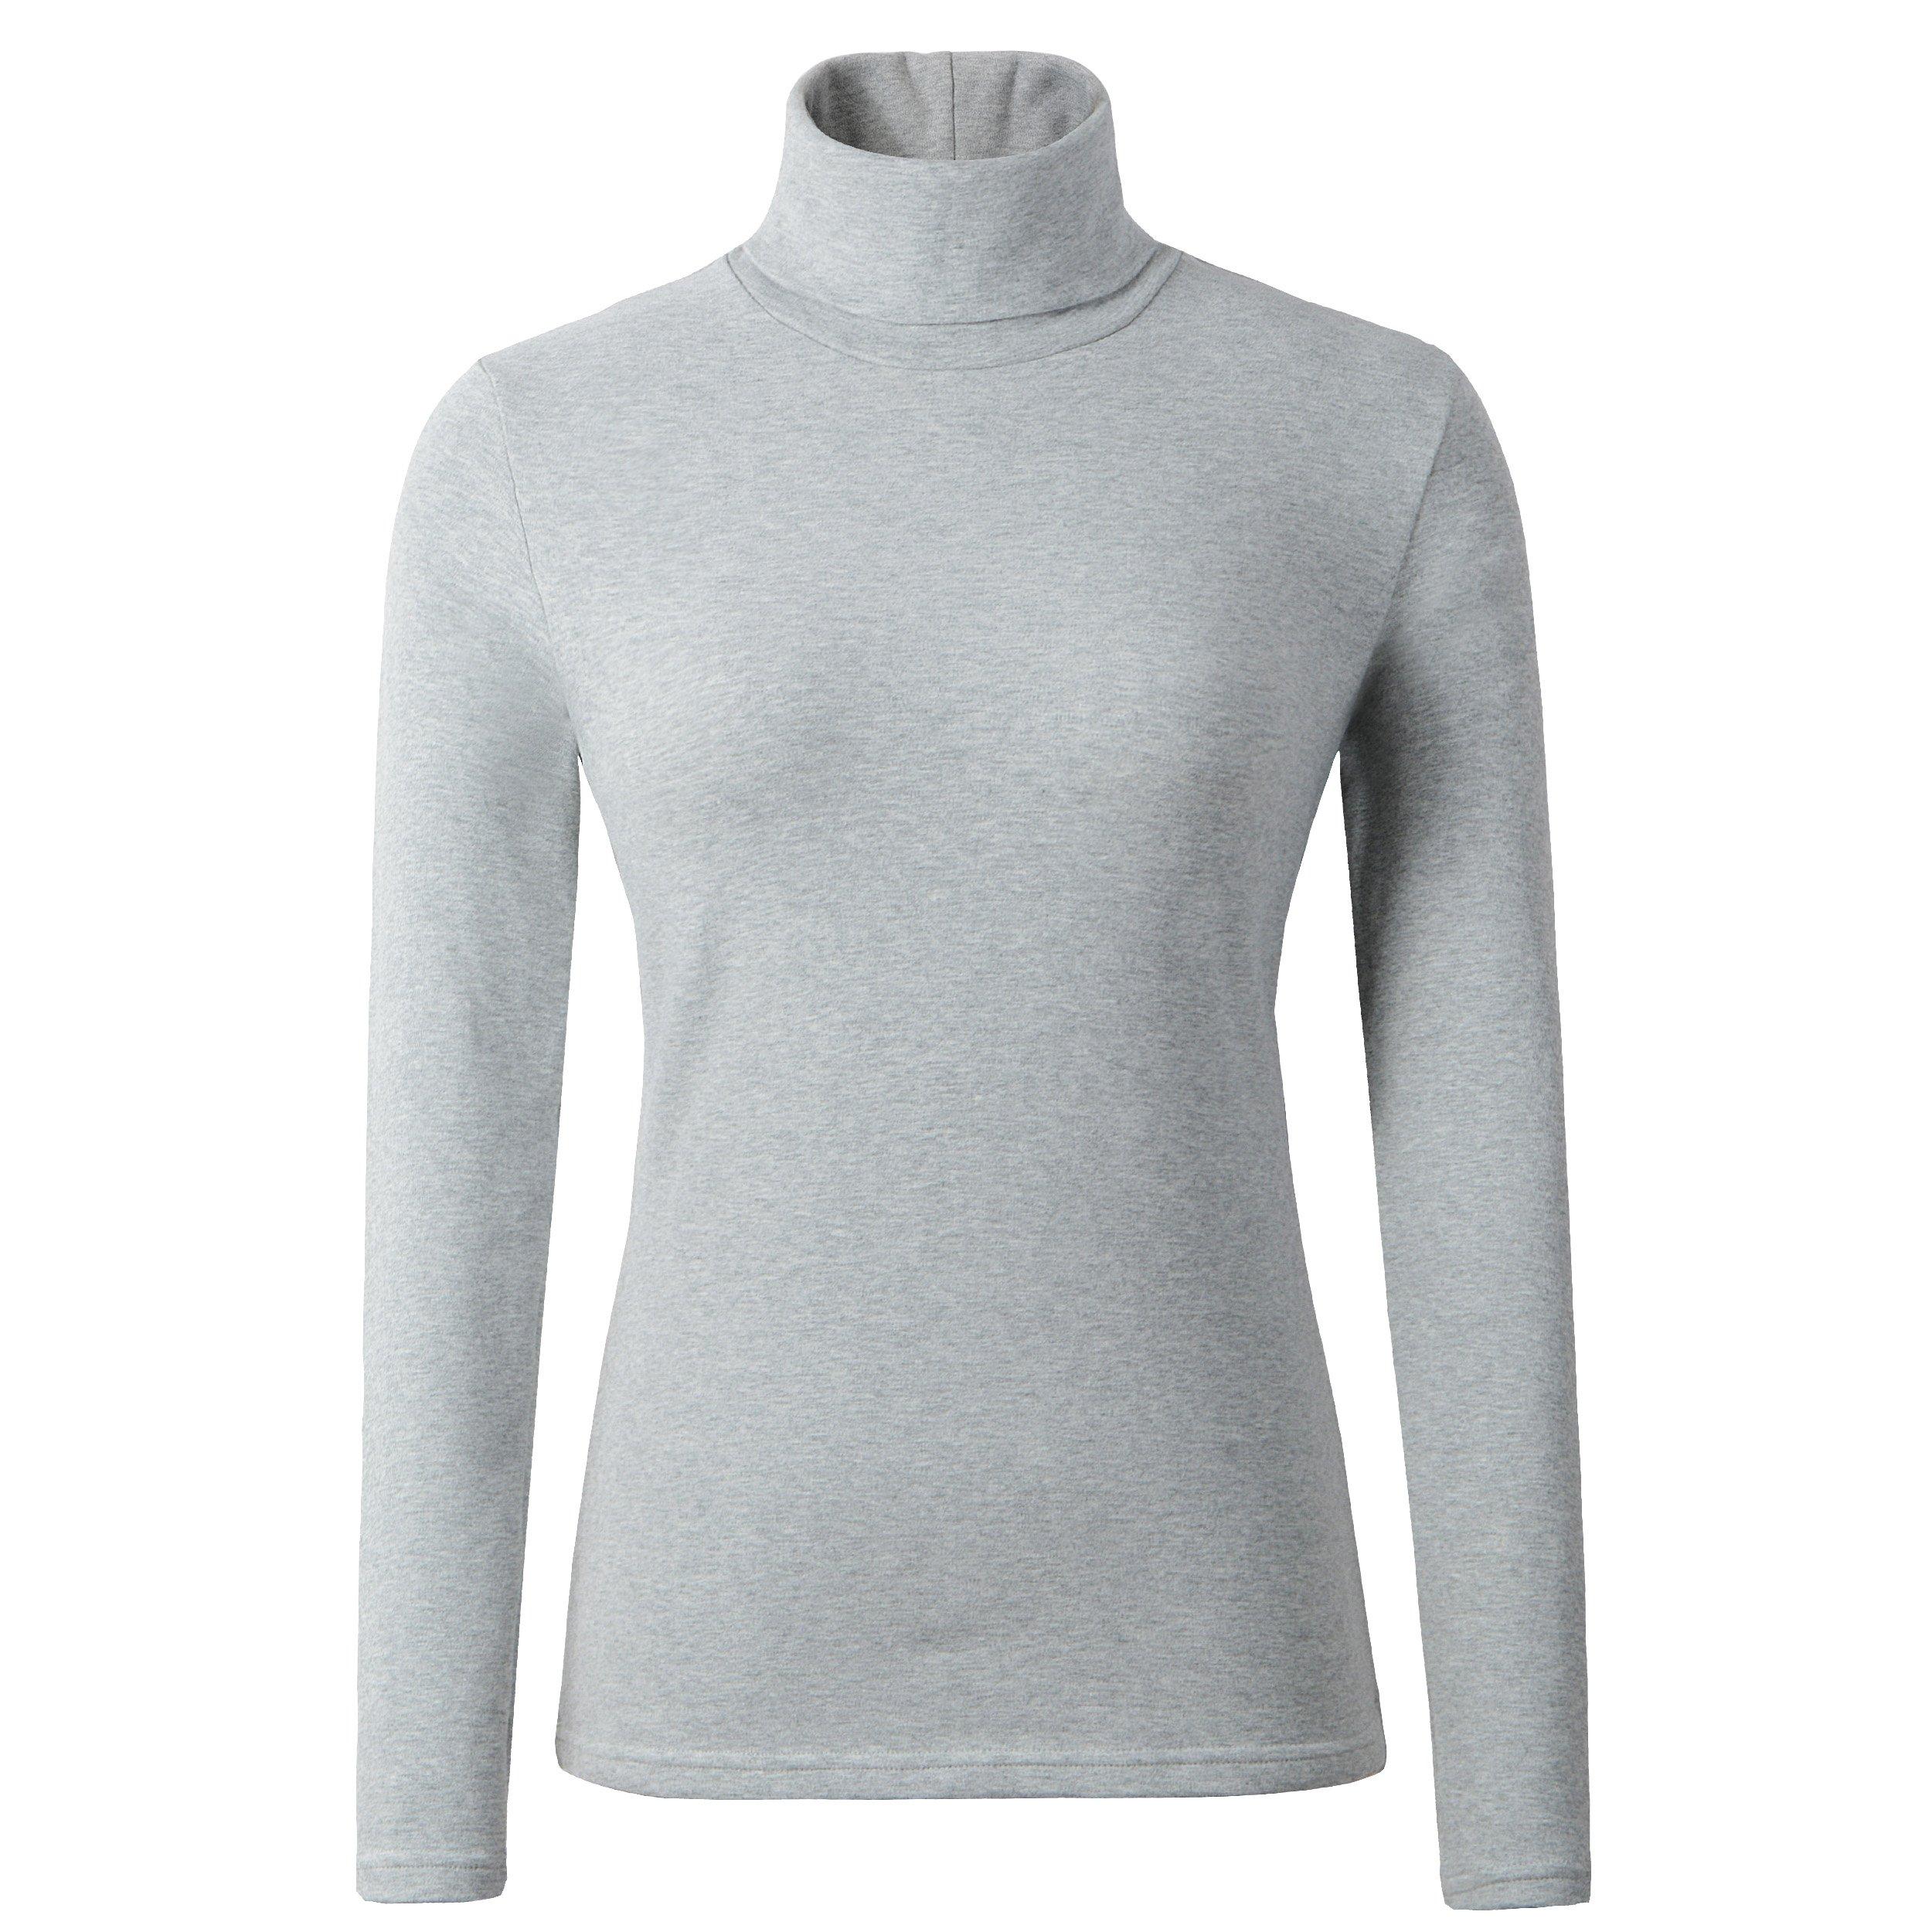 HieasyFit Women's Cotton Turtleneck Underscrub Knit Pullover Top LightGray S